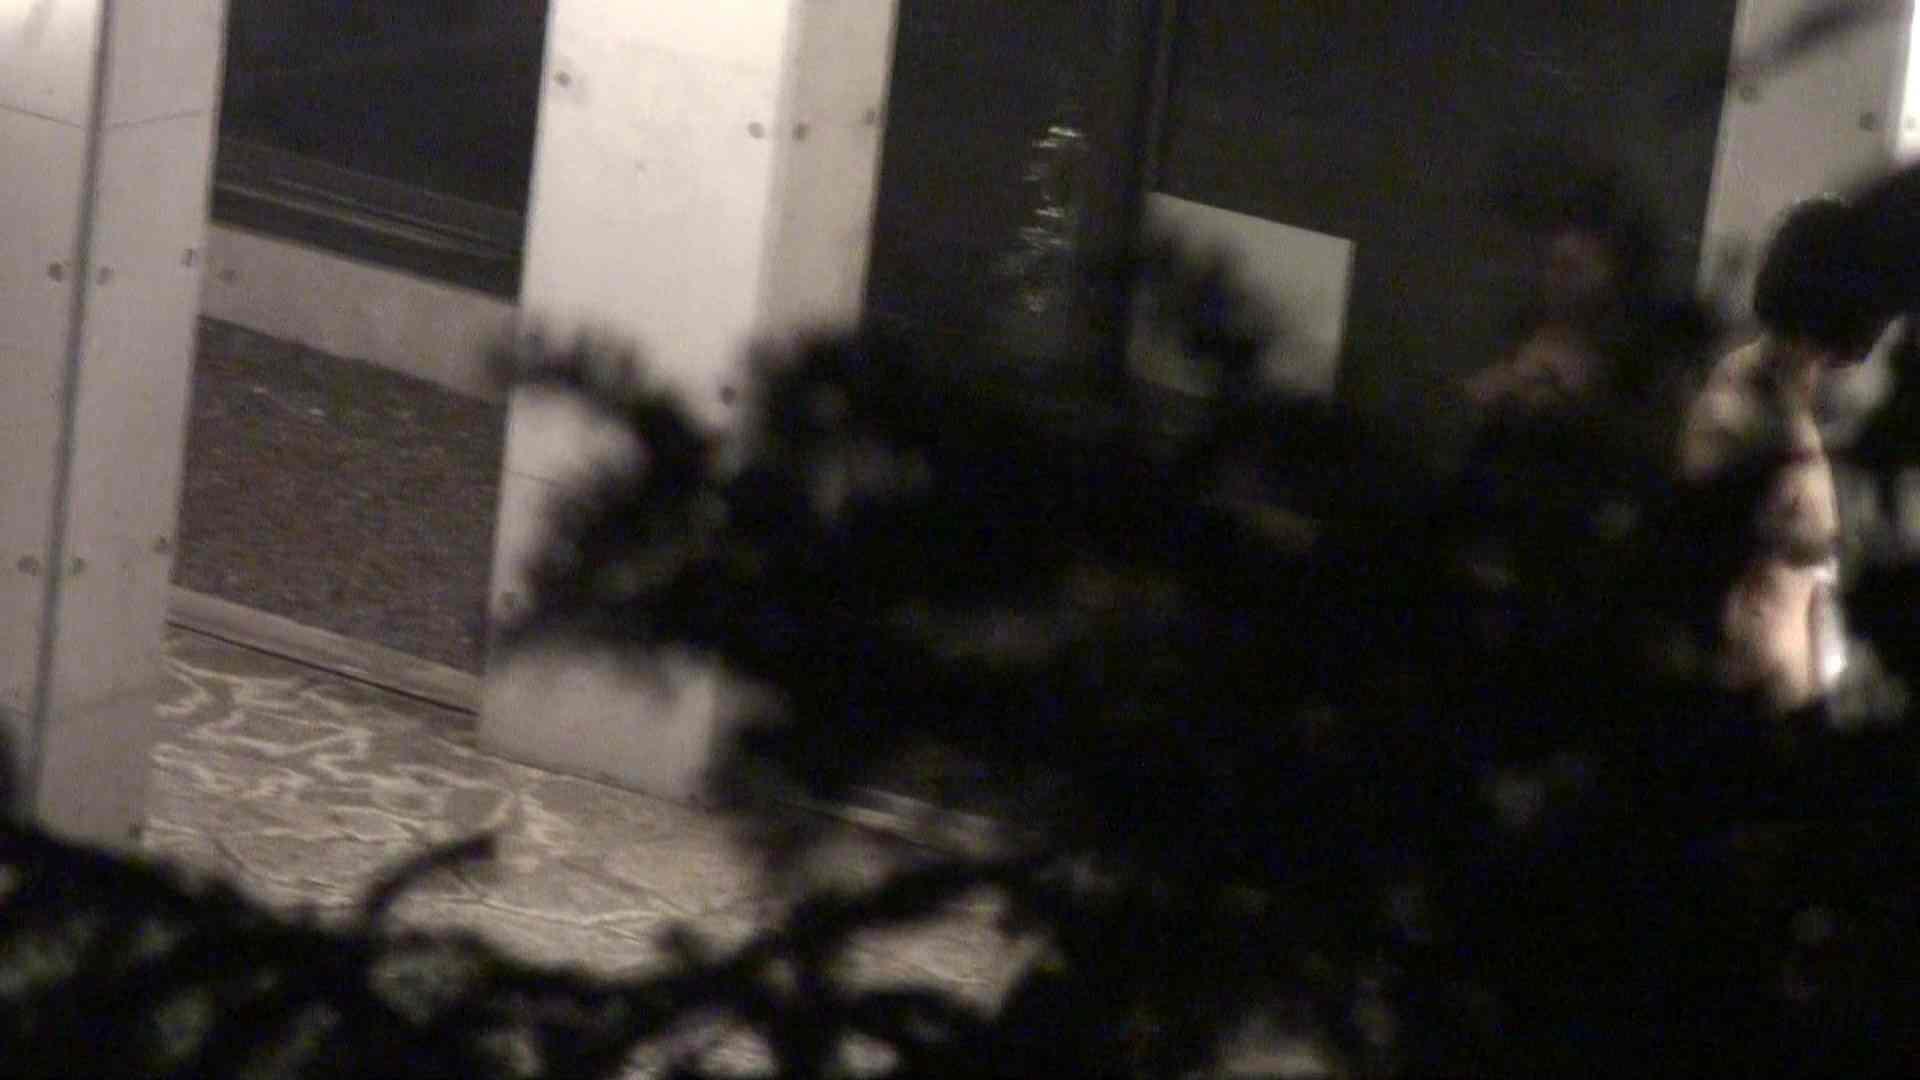 Aquaな露天風呂Vol.392 盗撮 オマンコ無修正動画無料 96画像 74